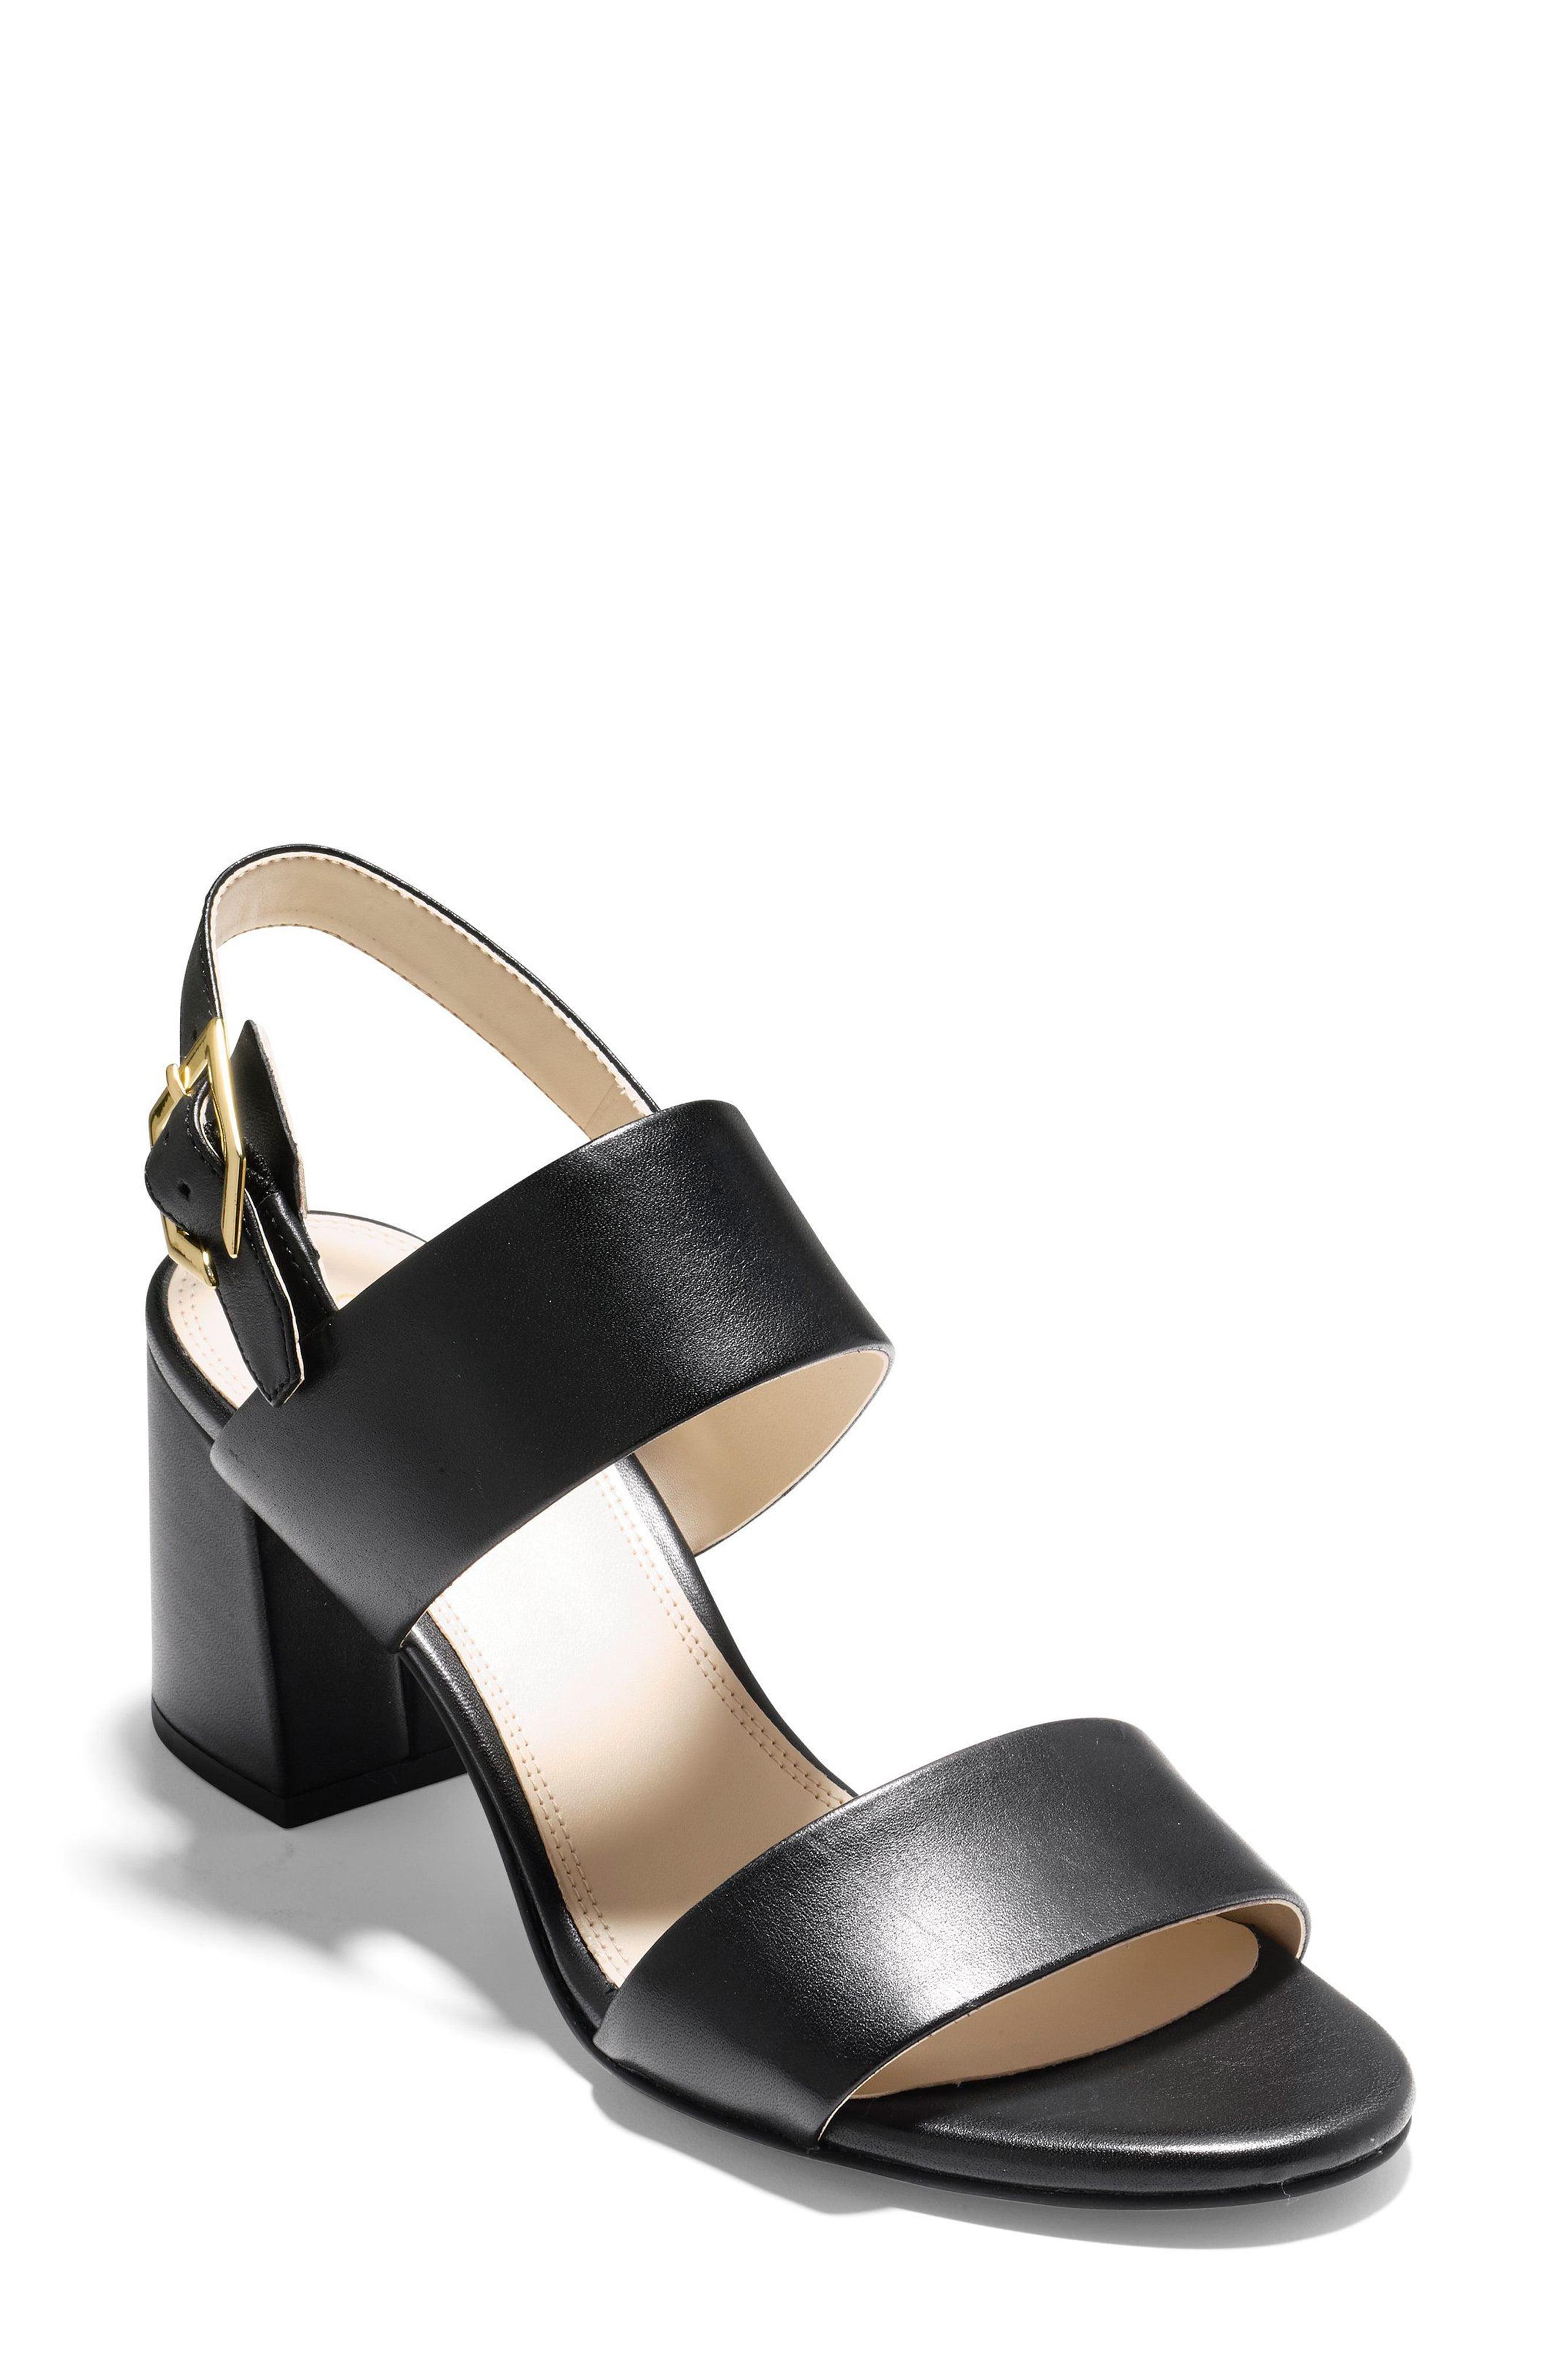 eba1e05f54 Lyst - Cole Haan Avani Block Heel Sandal in Black - Save 27%